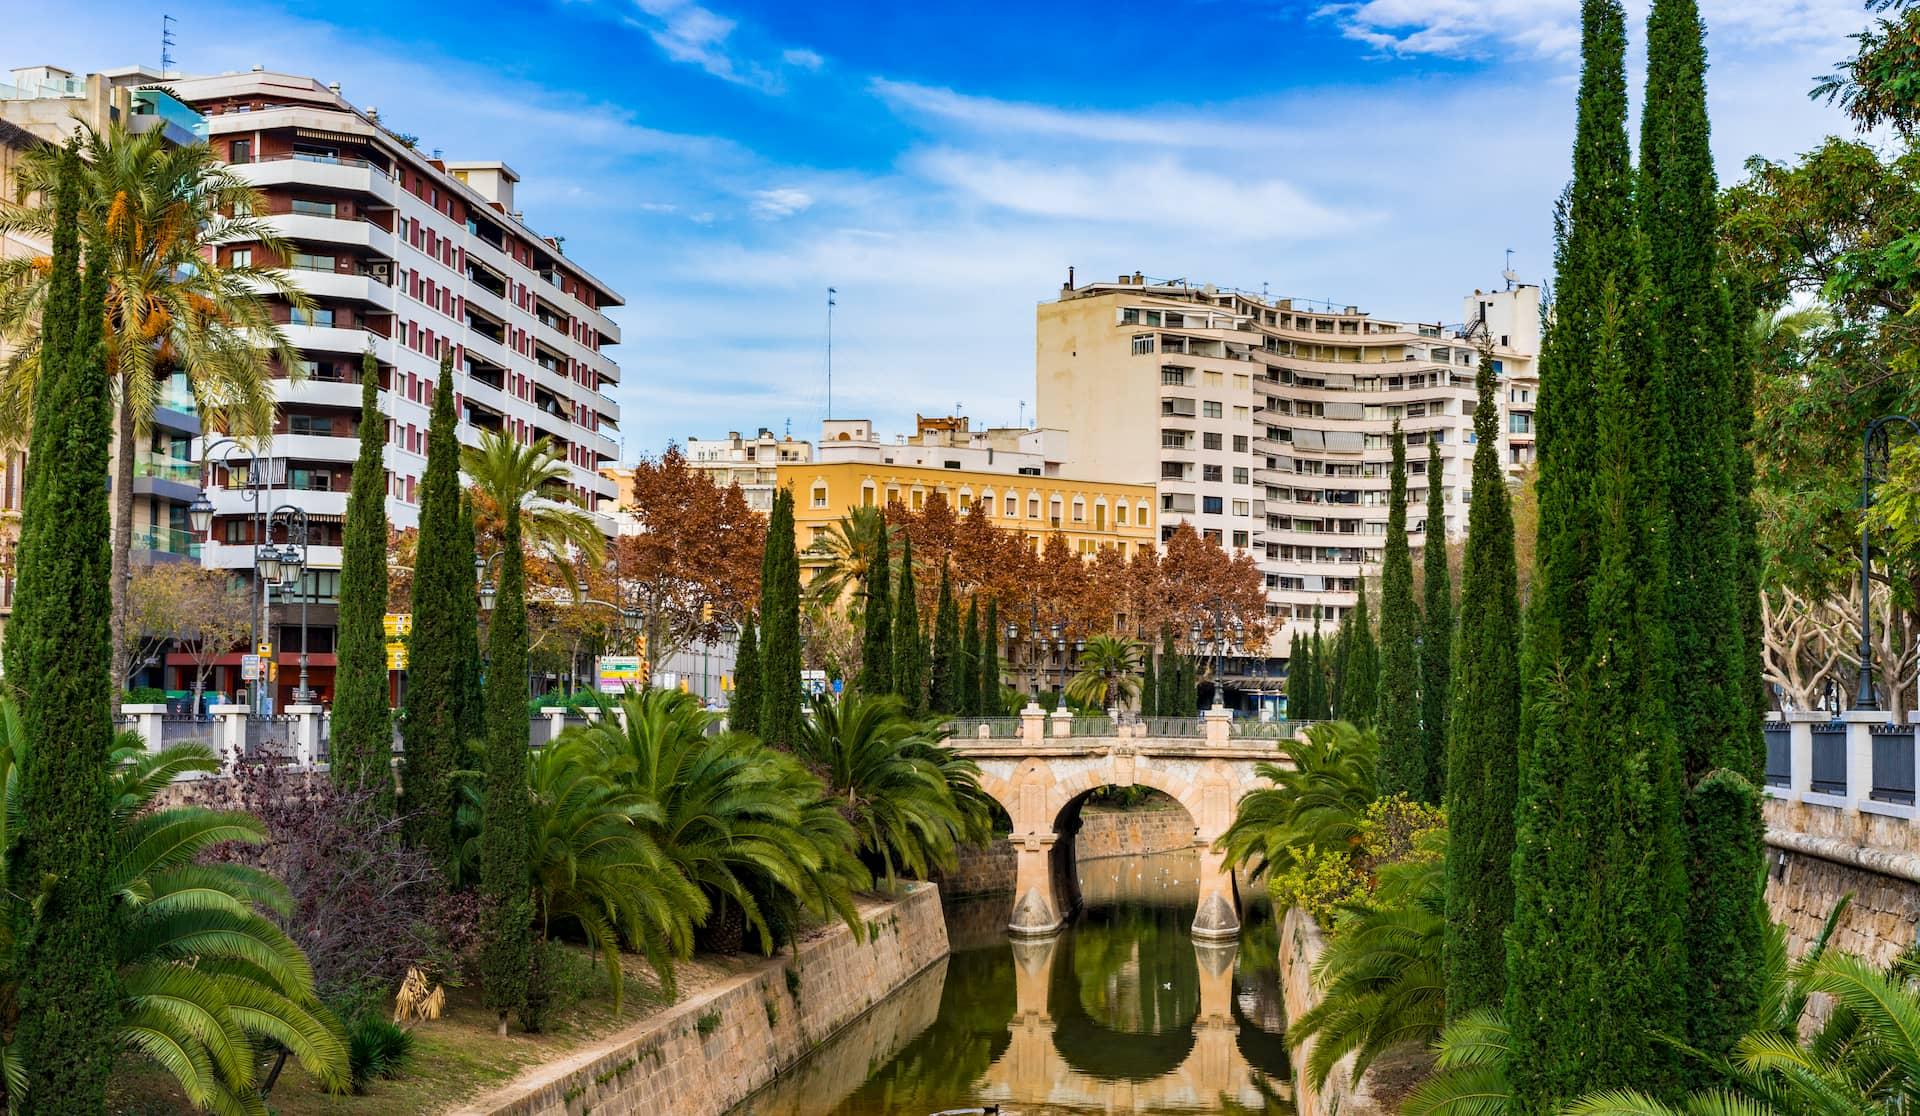 Das perfekte Wochenende  auf Palma